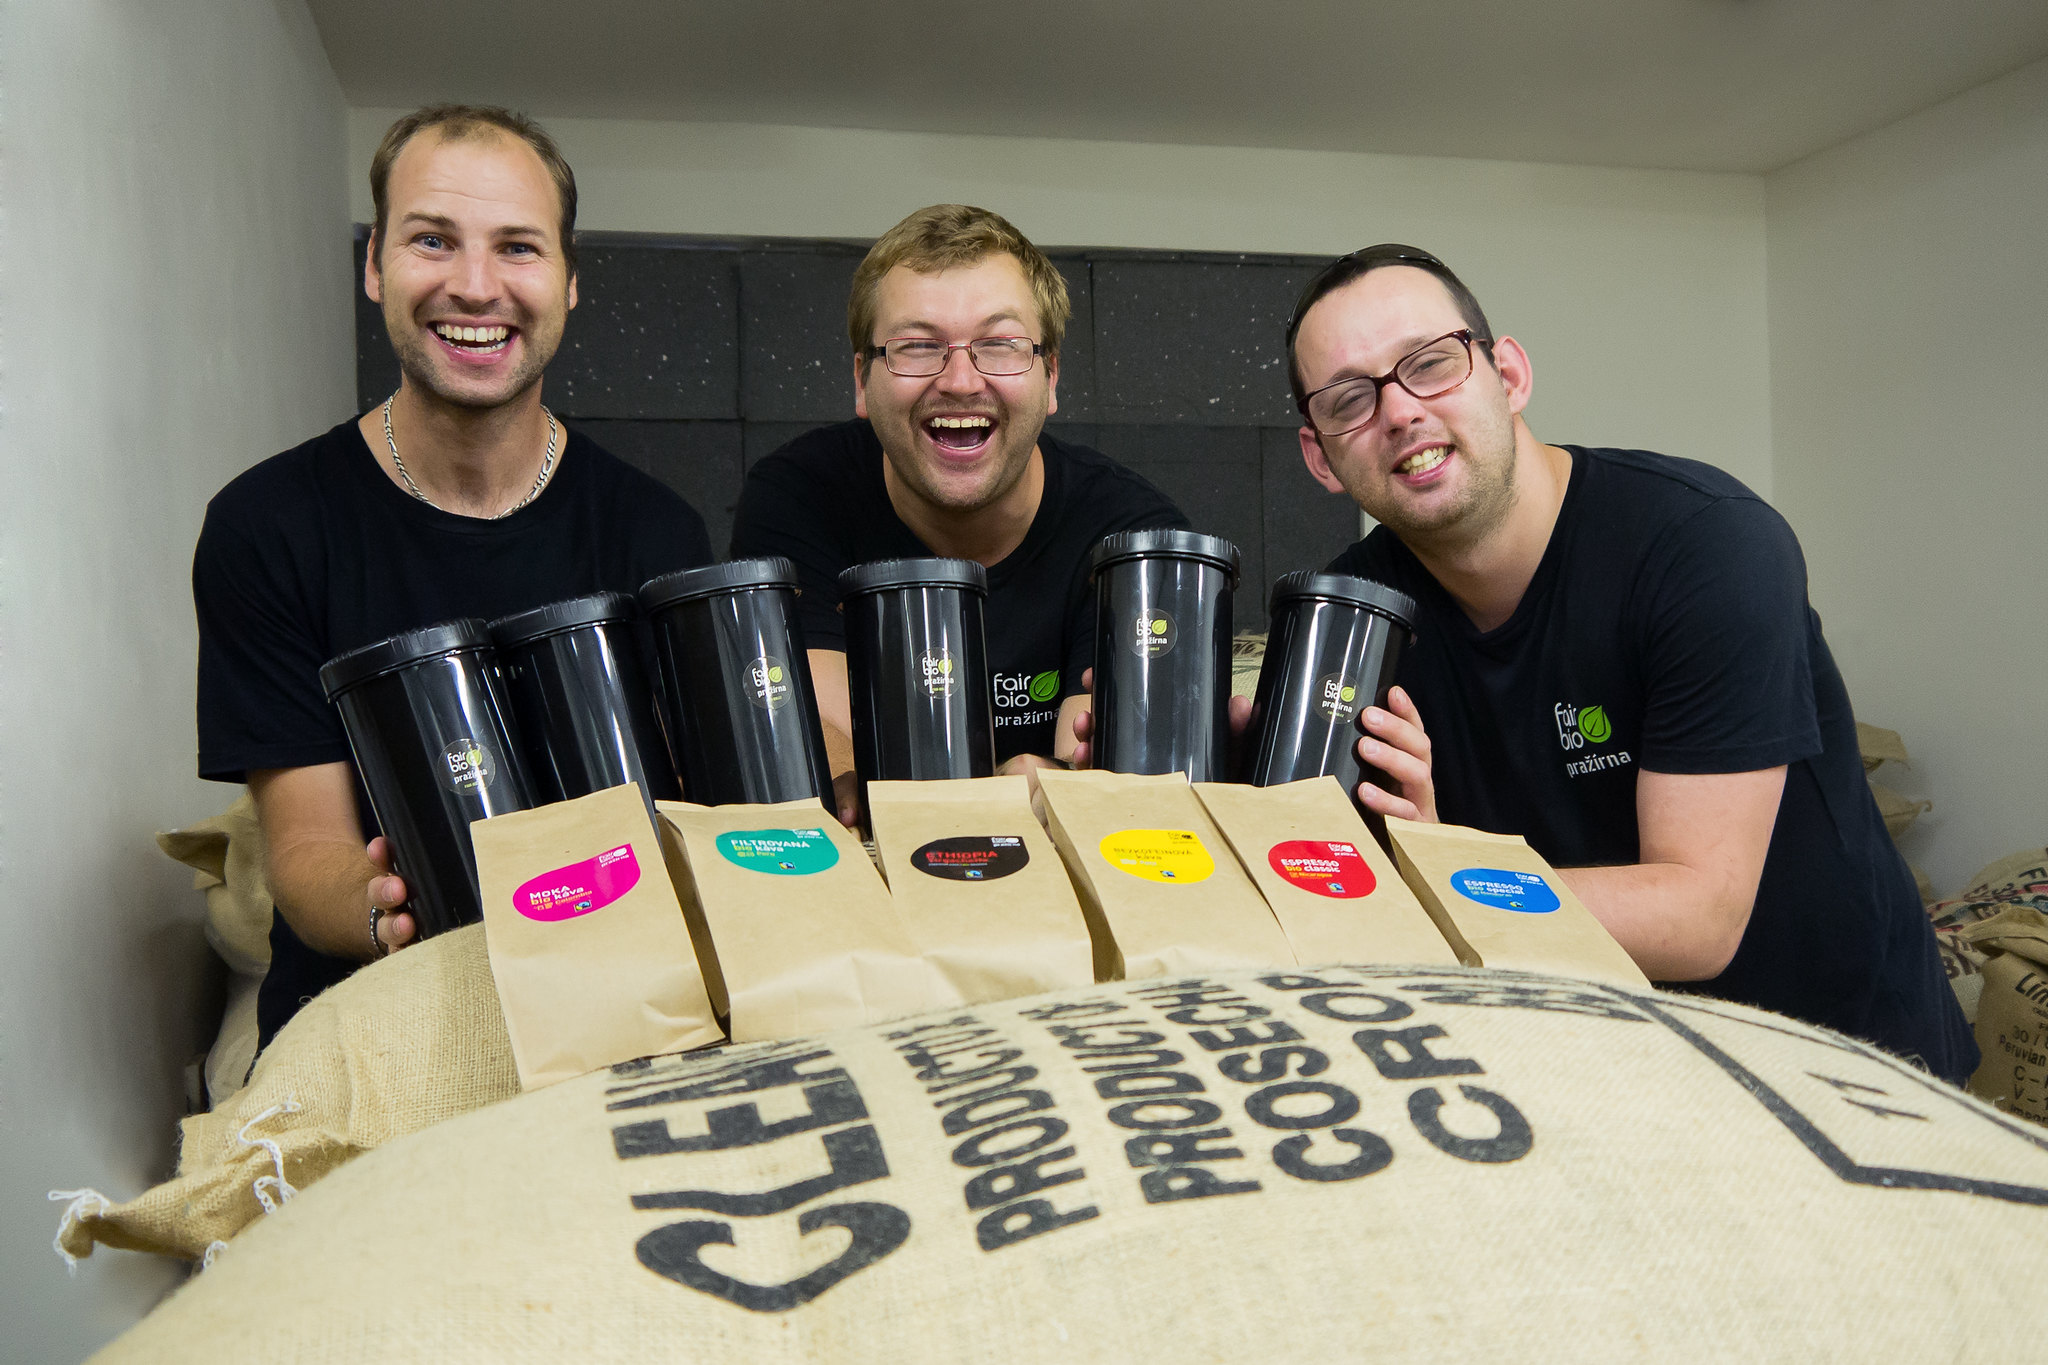 Předplaťte si Fair & Bio kávu, jde to i bezobalově